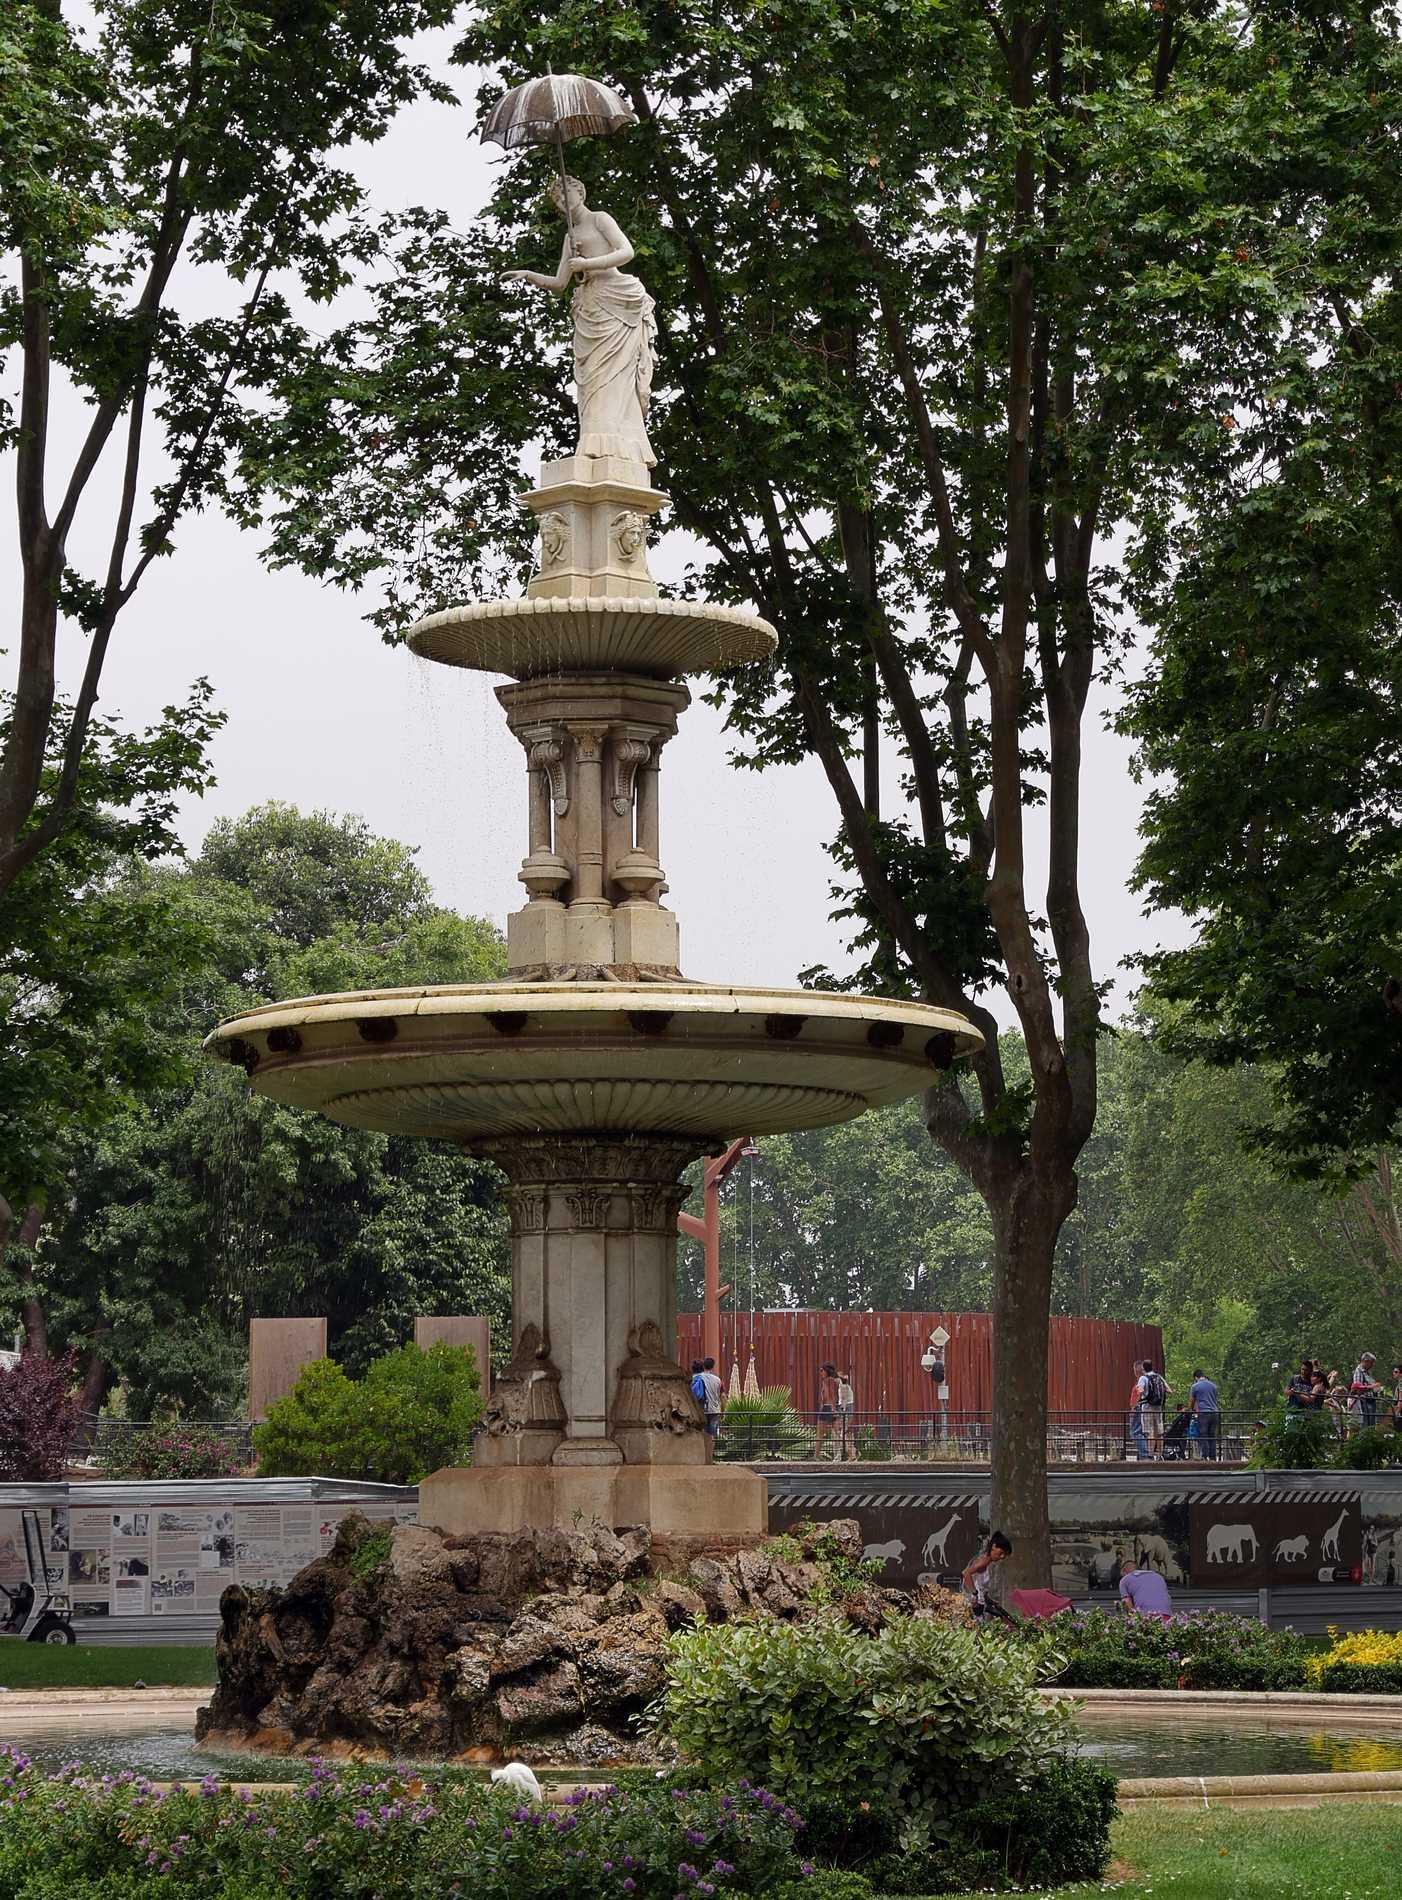 zoo barcelone fontaine - juliesliberties